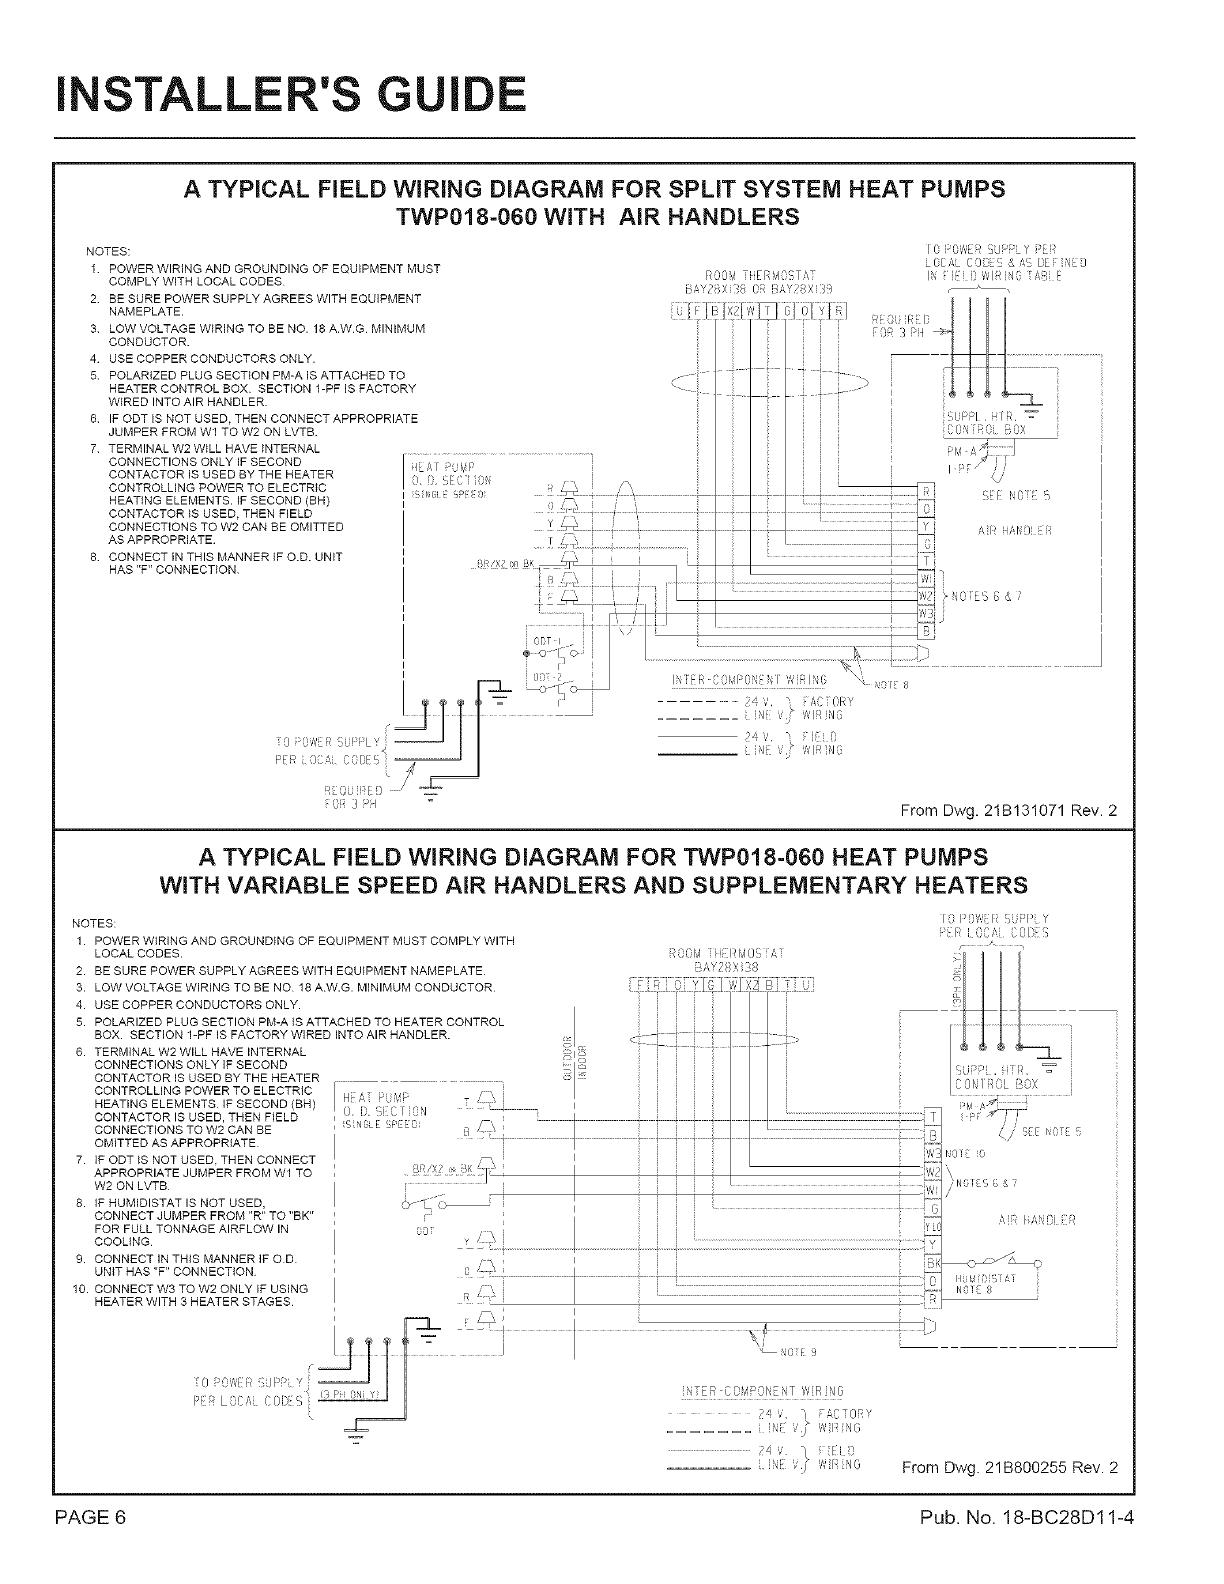 Trane Wiring Diagram Heat Pump from usermanual.wiki